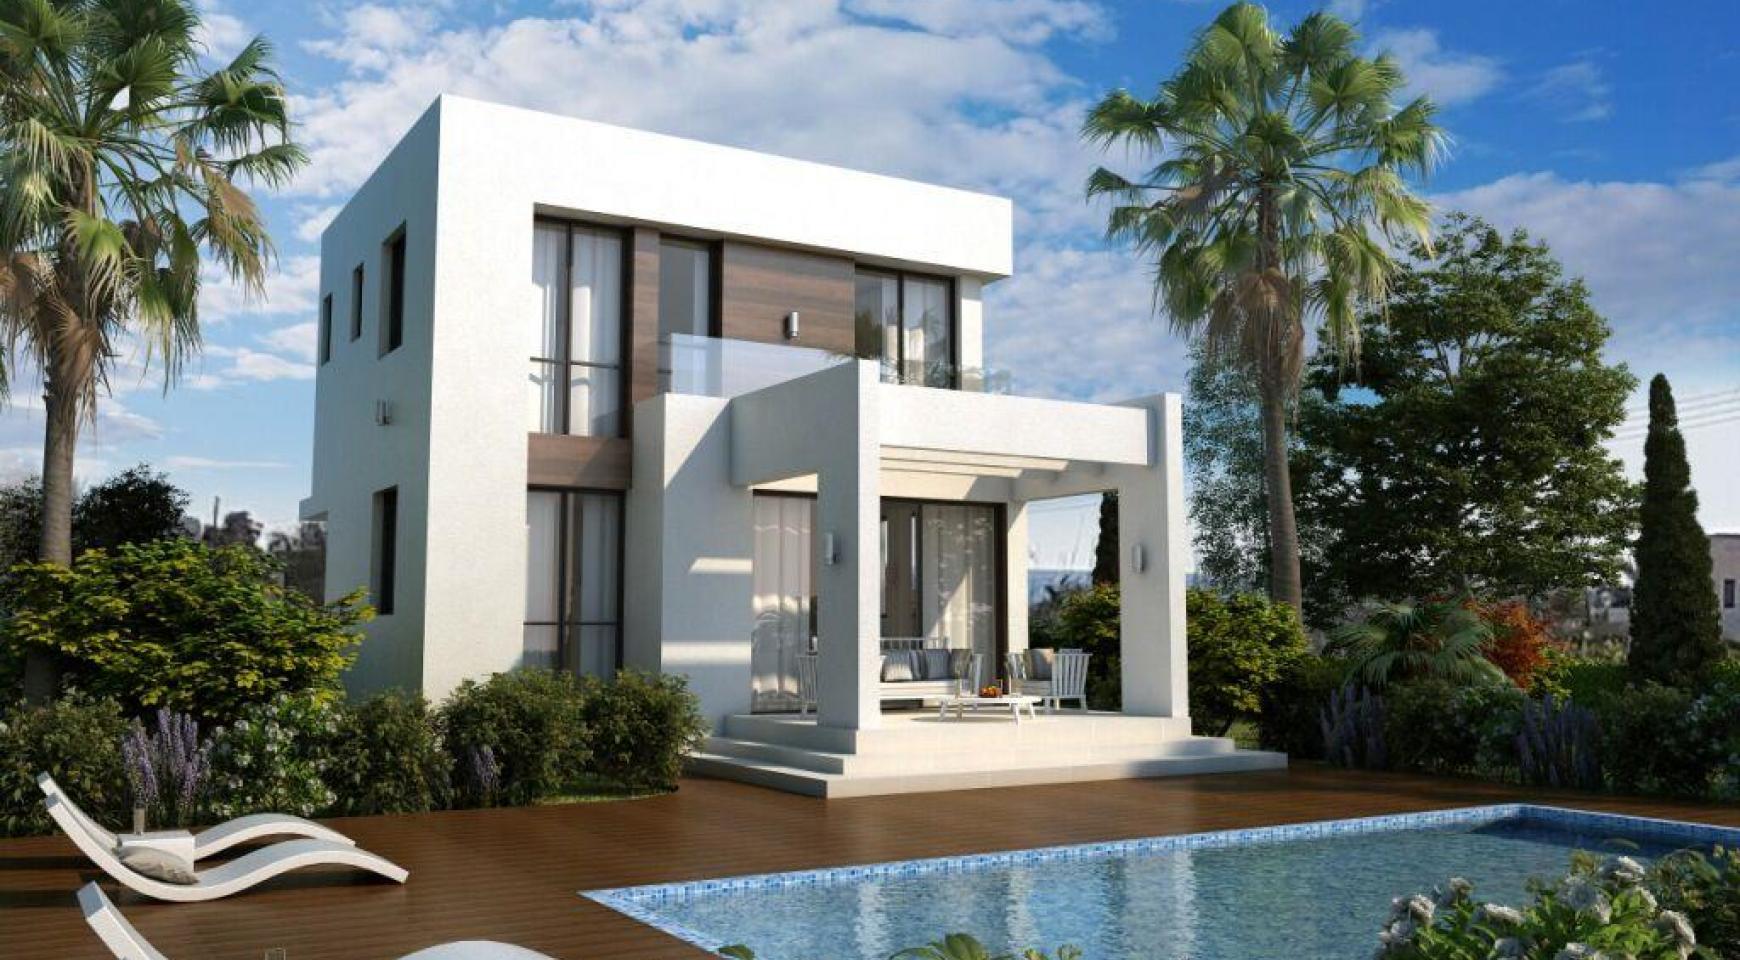 Modern 3 Bedroom Villa in a Complex near the Beach - 11